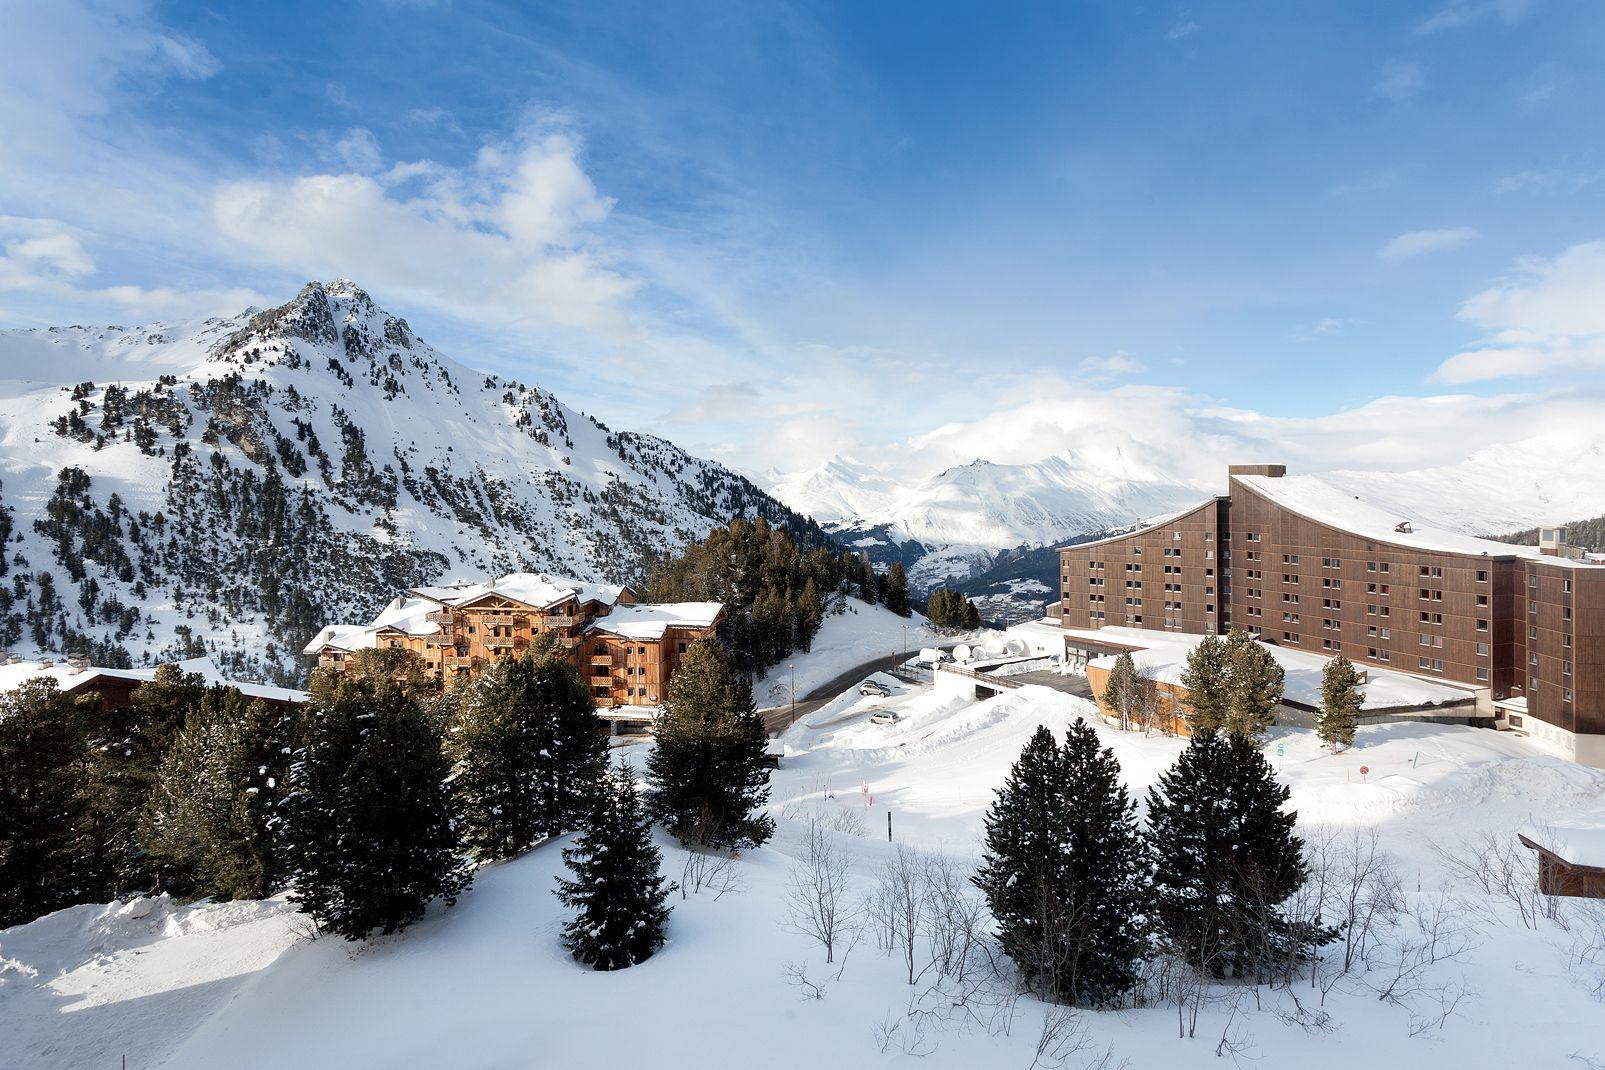 Hôtel Club mmv Altitude Village Vacances 4* - ARC 2000 - 1